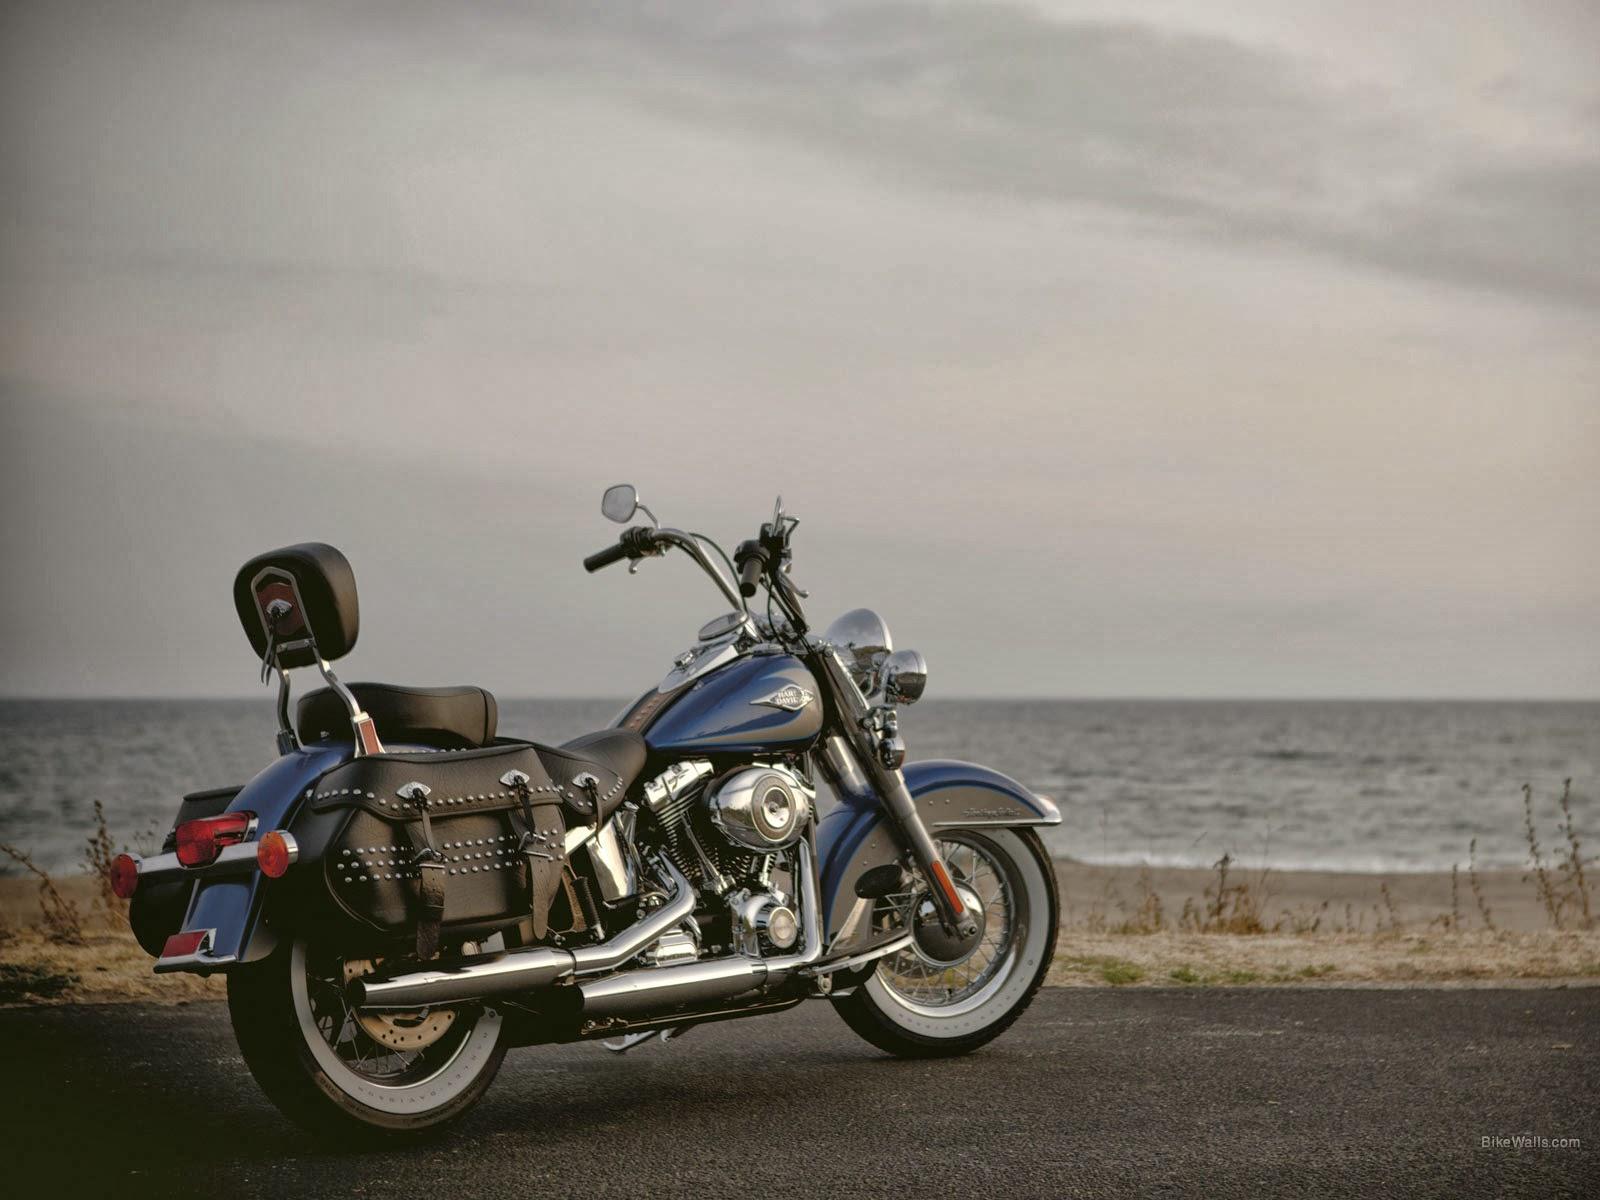 Harley Davidson FLSTC Heritage